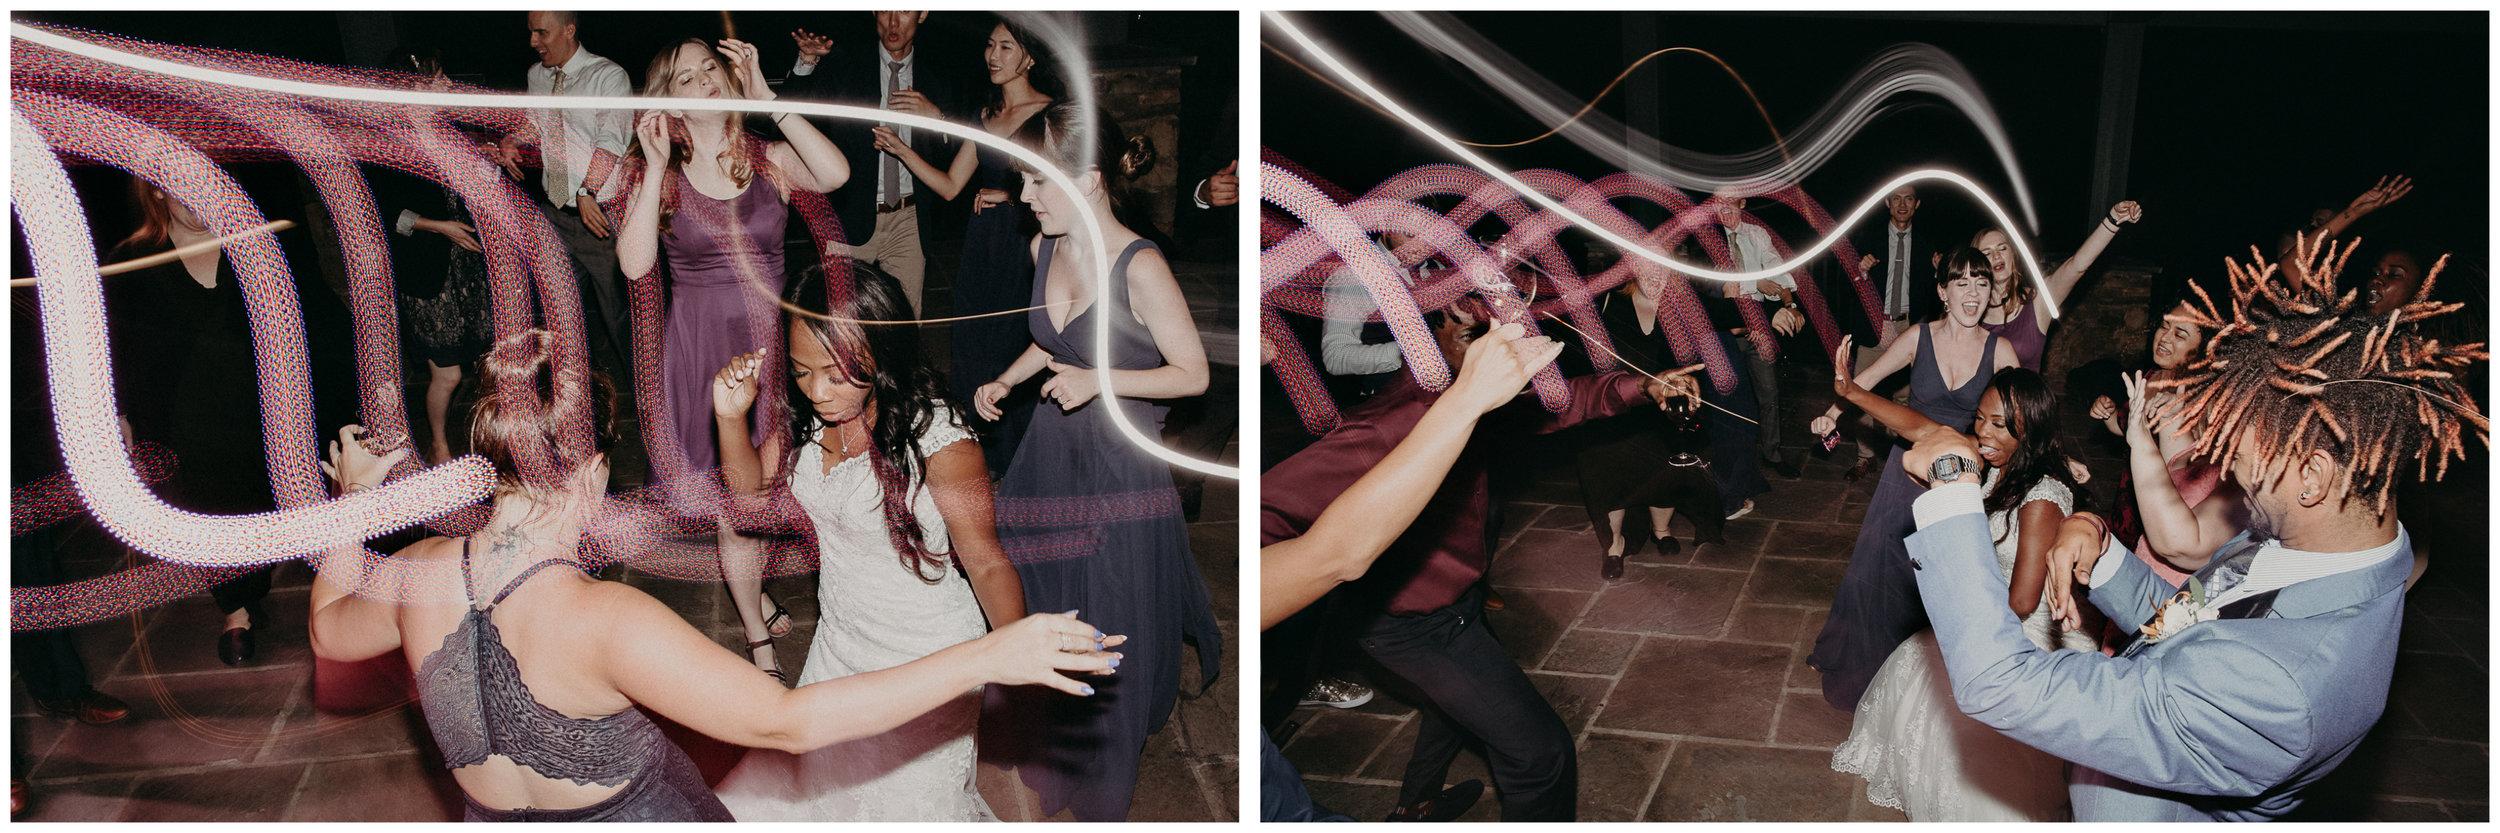 96- Kaya_vineyard_dahlonega_wedding_venue_detais_reception_aline_marin_photography.jpg